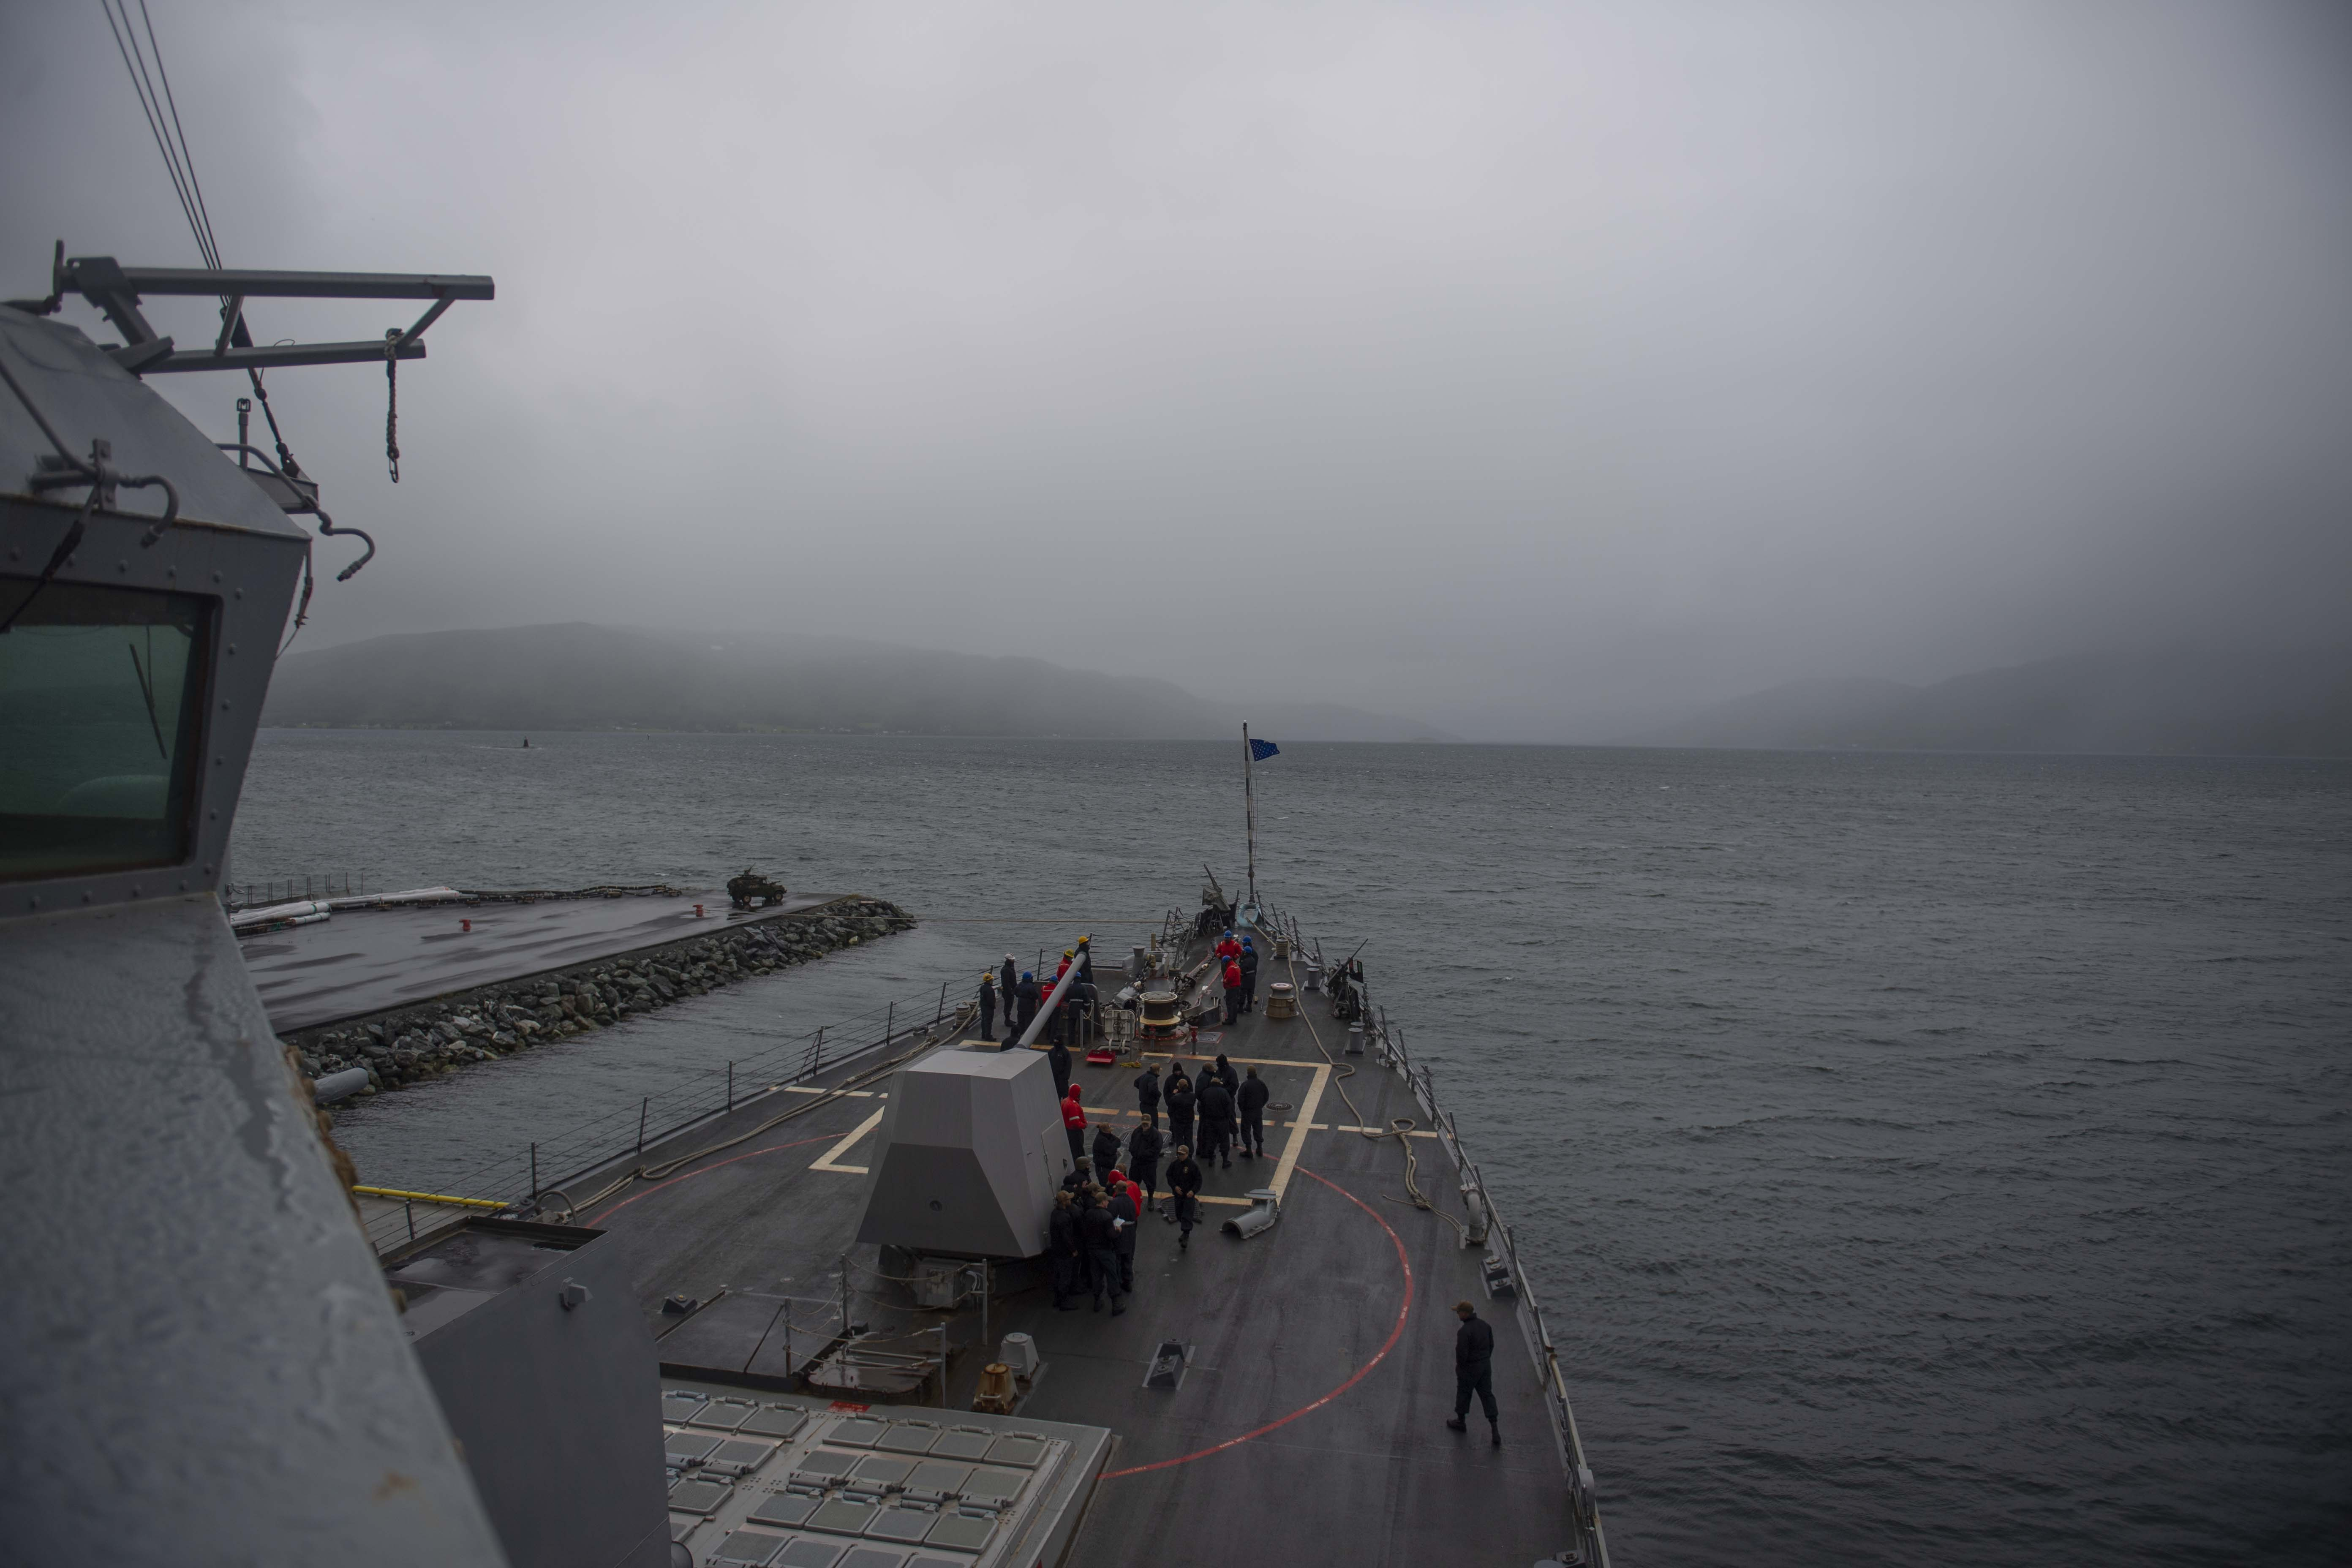 Arleigh Burke-class guided-missile destroyer USS Roosevelt (DDG 80)